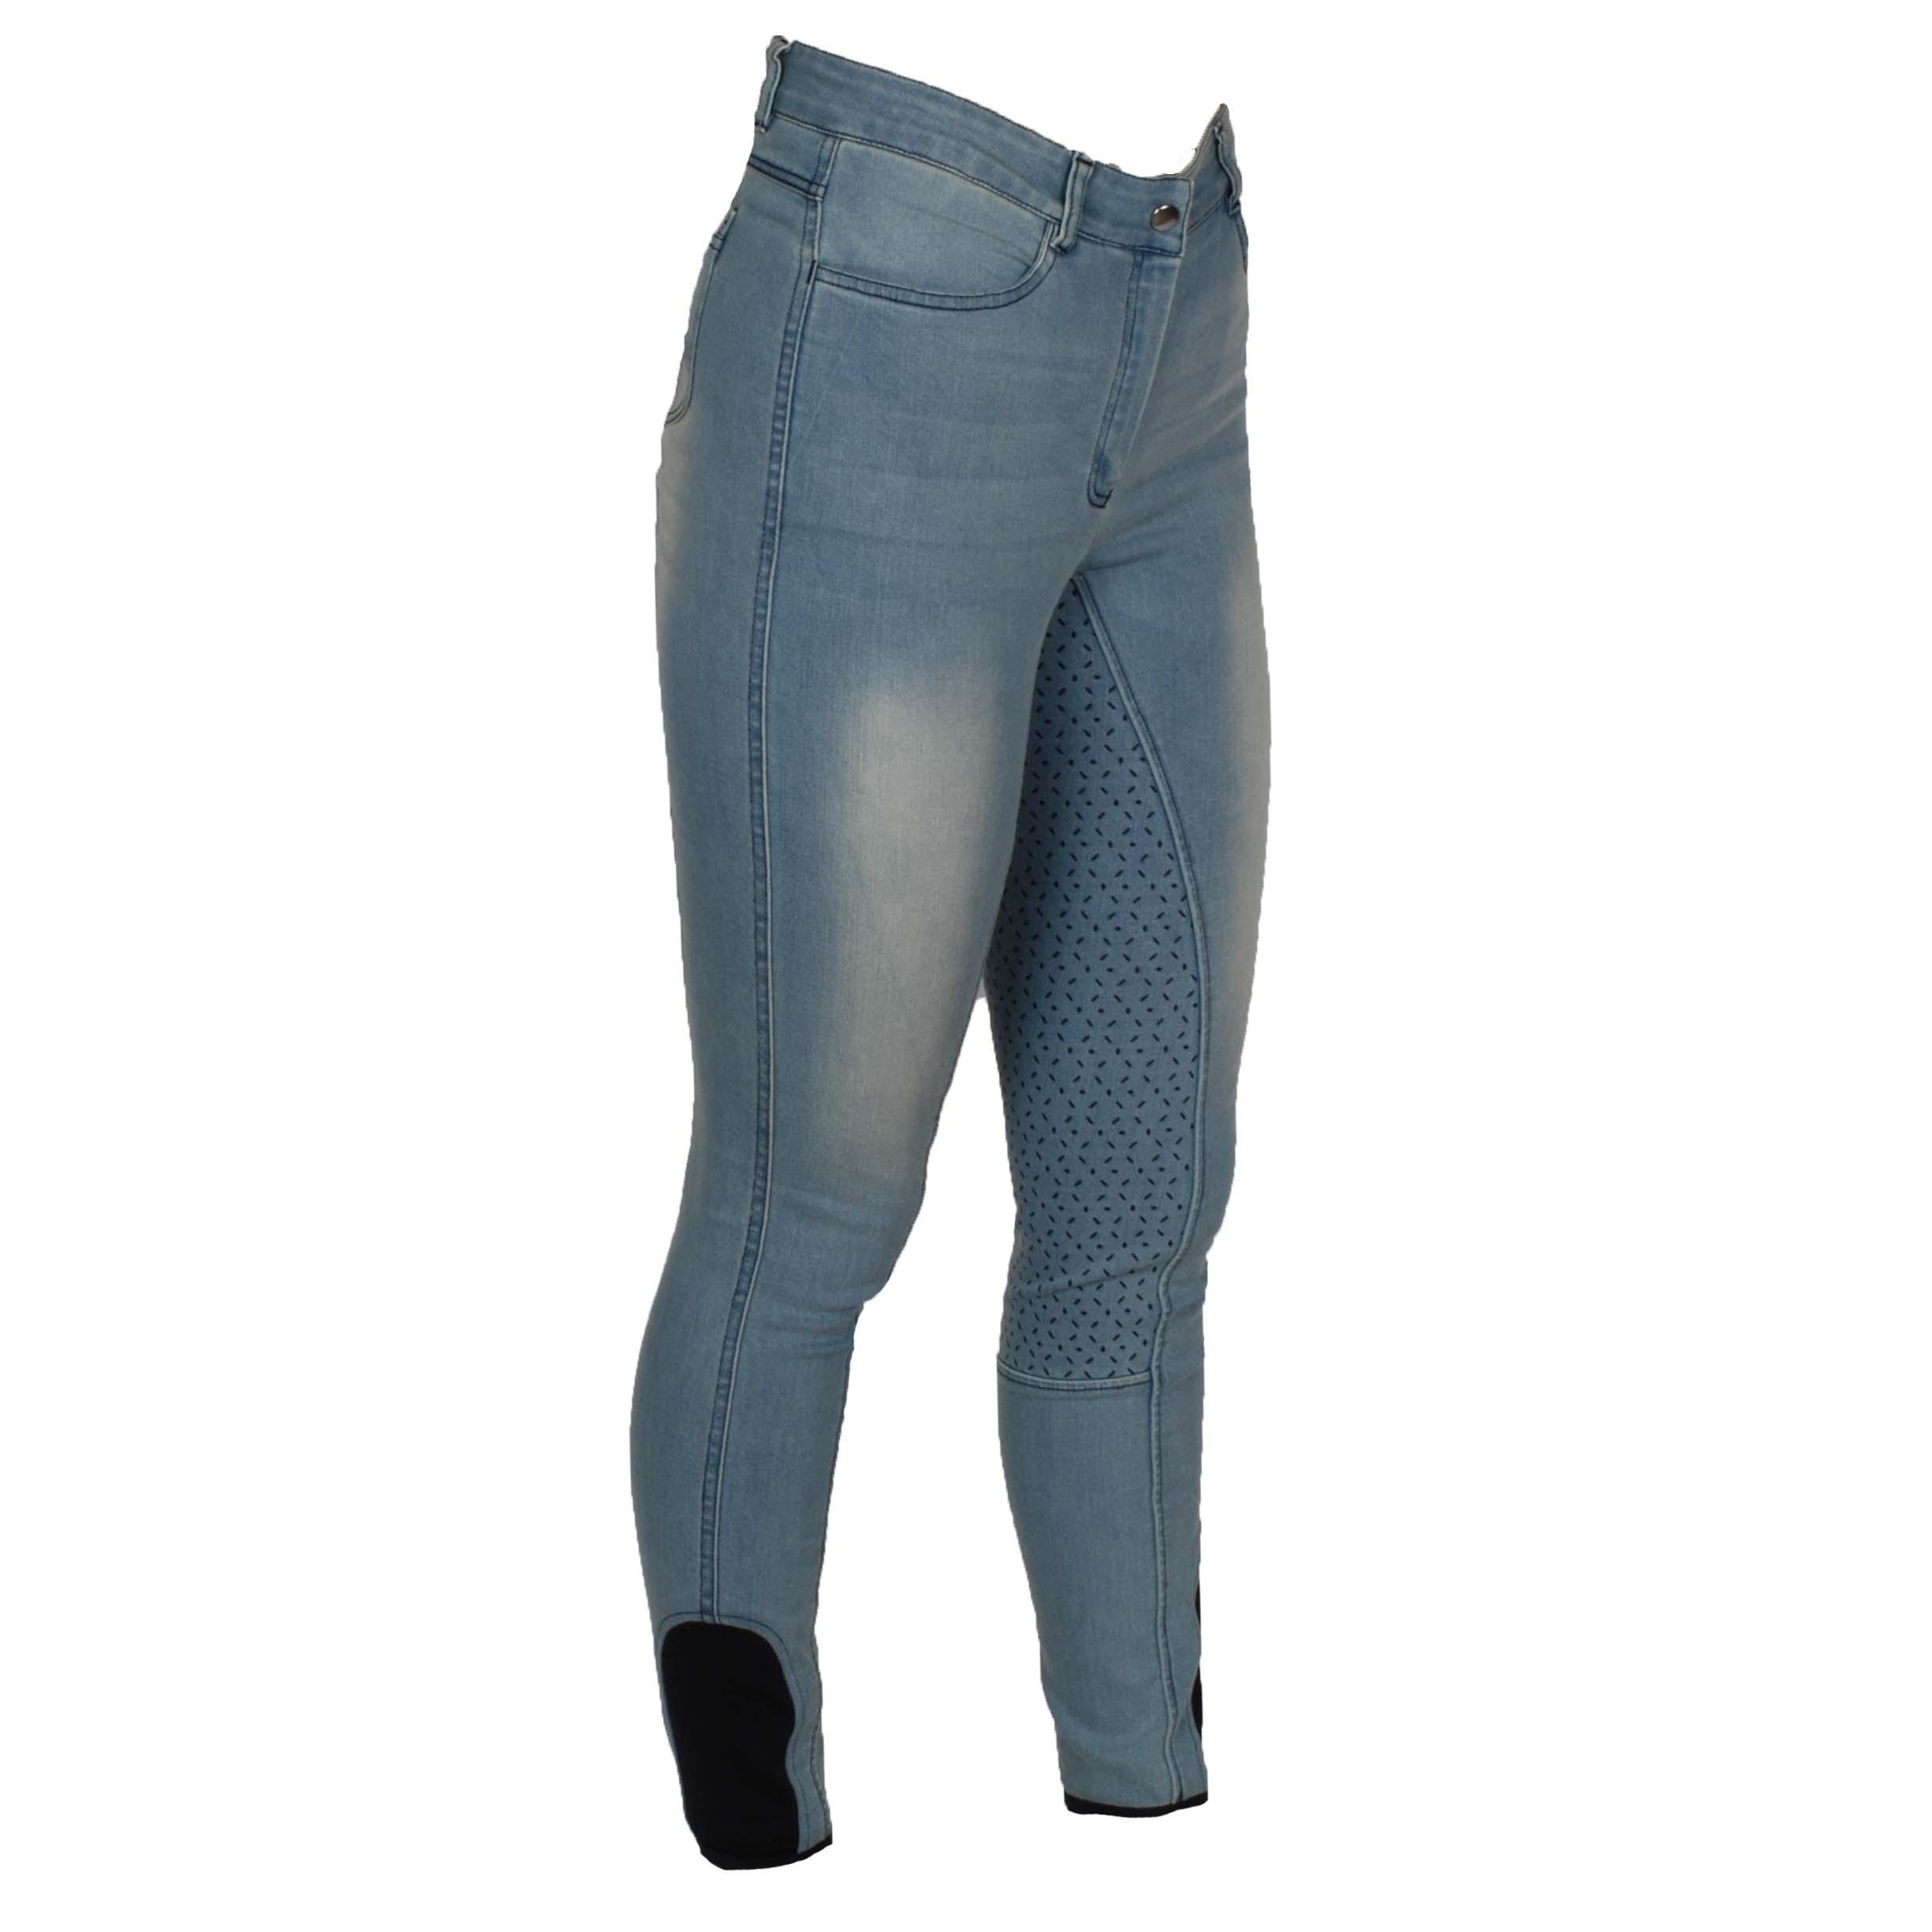 Mondoni Bellville jeans FG rijbroek jeans maat:44